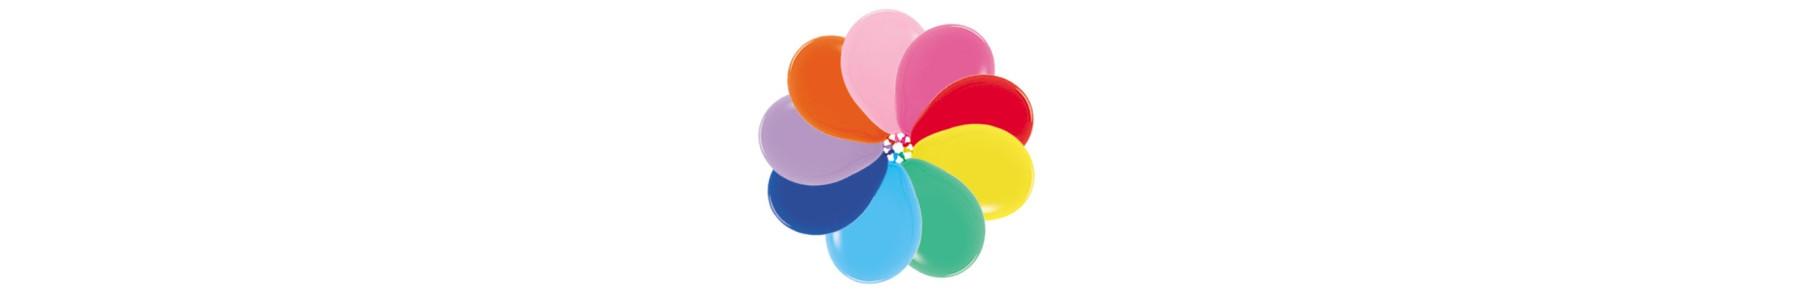 Baloane rotunde SEMPERTEX